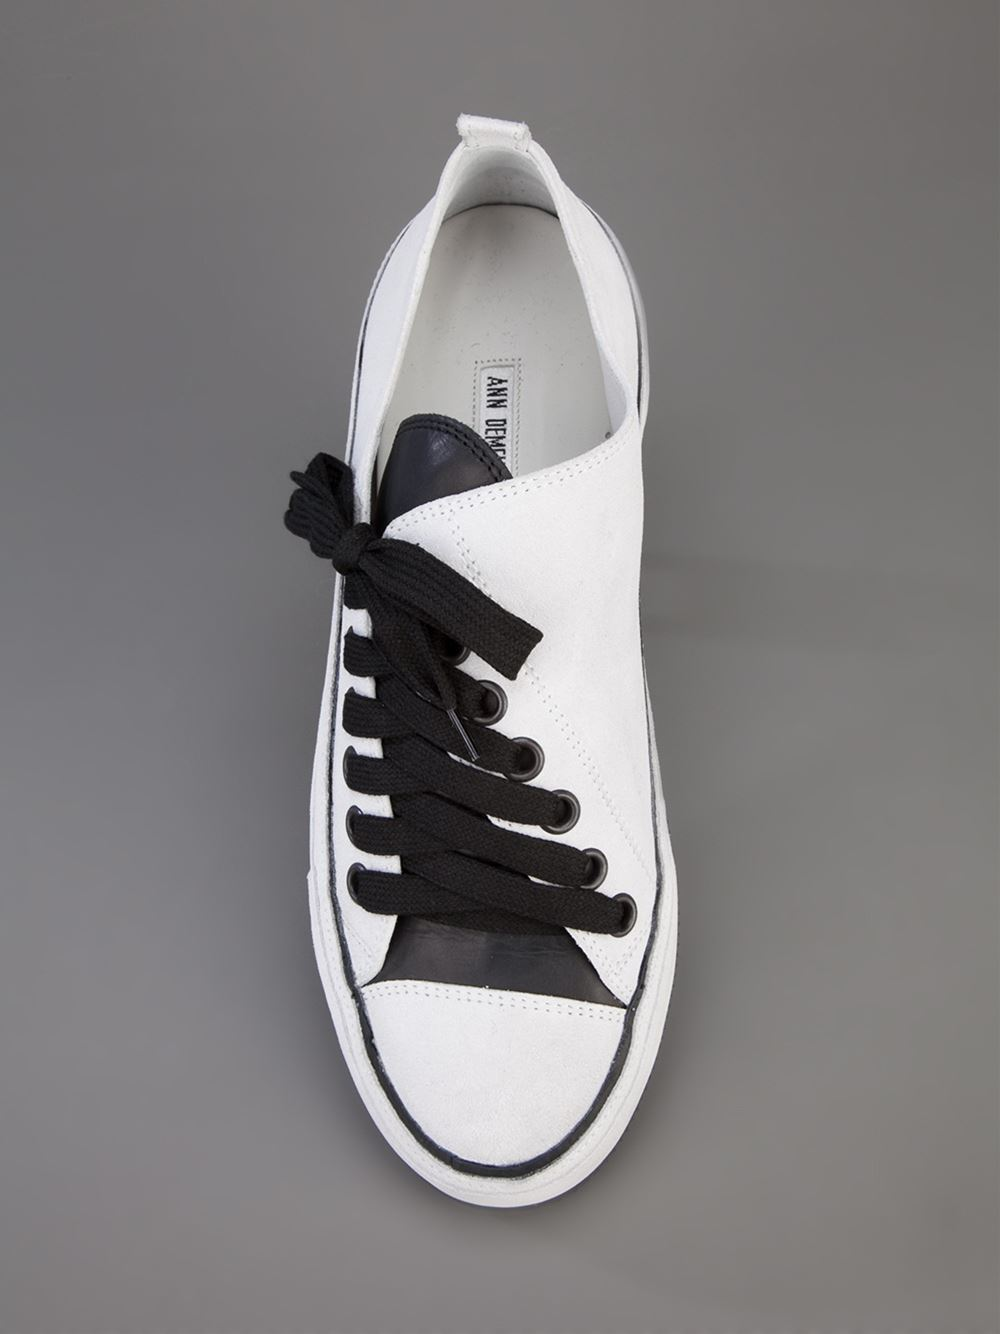 Ann Demeulemeester Blanche Asymmetric Sneaker - - Farfetch.com